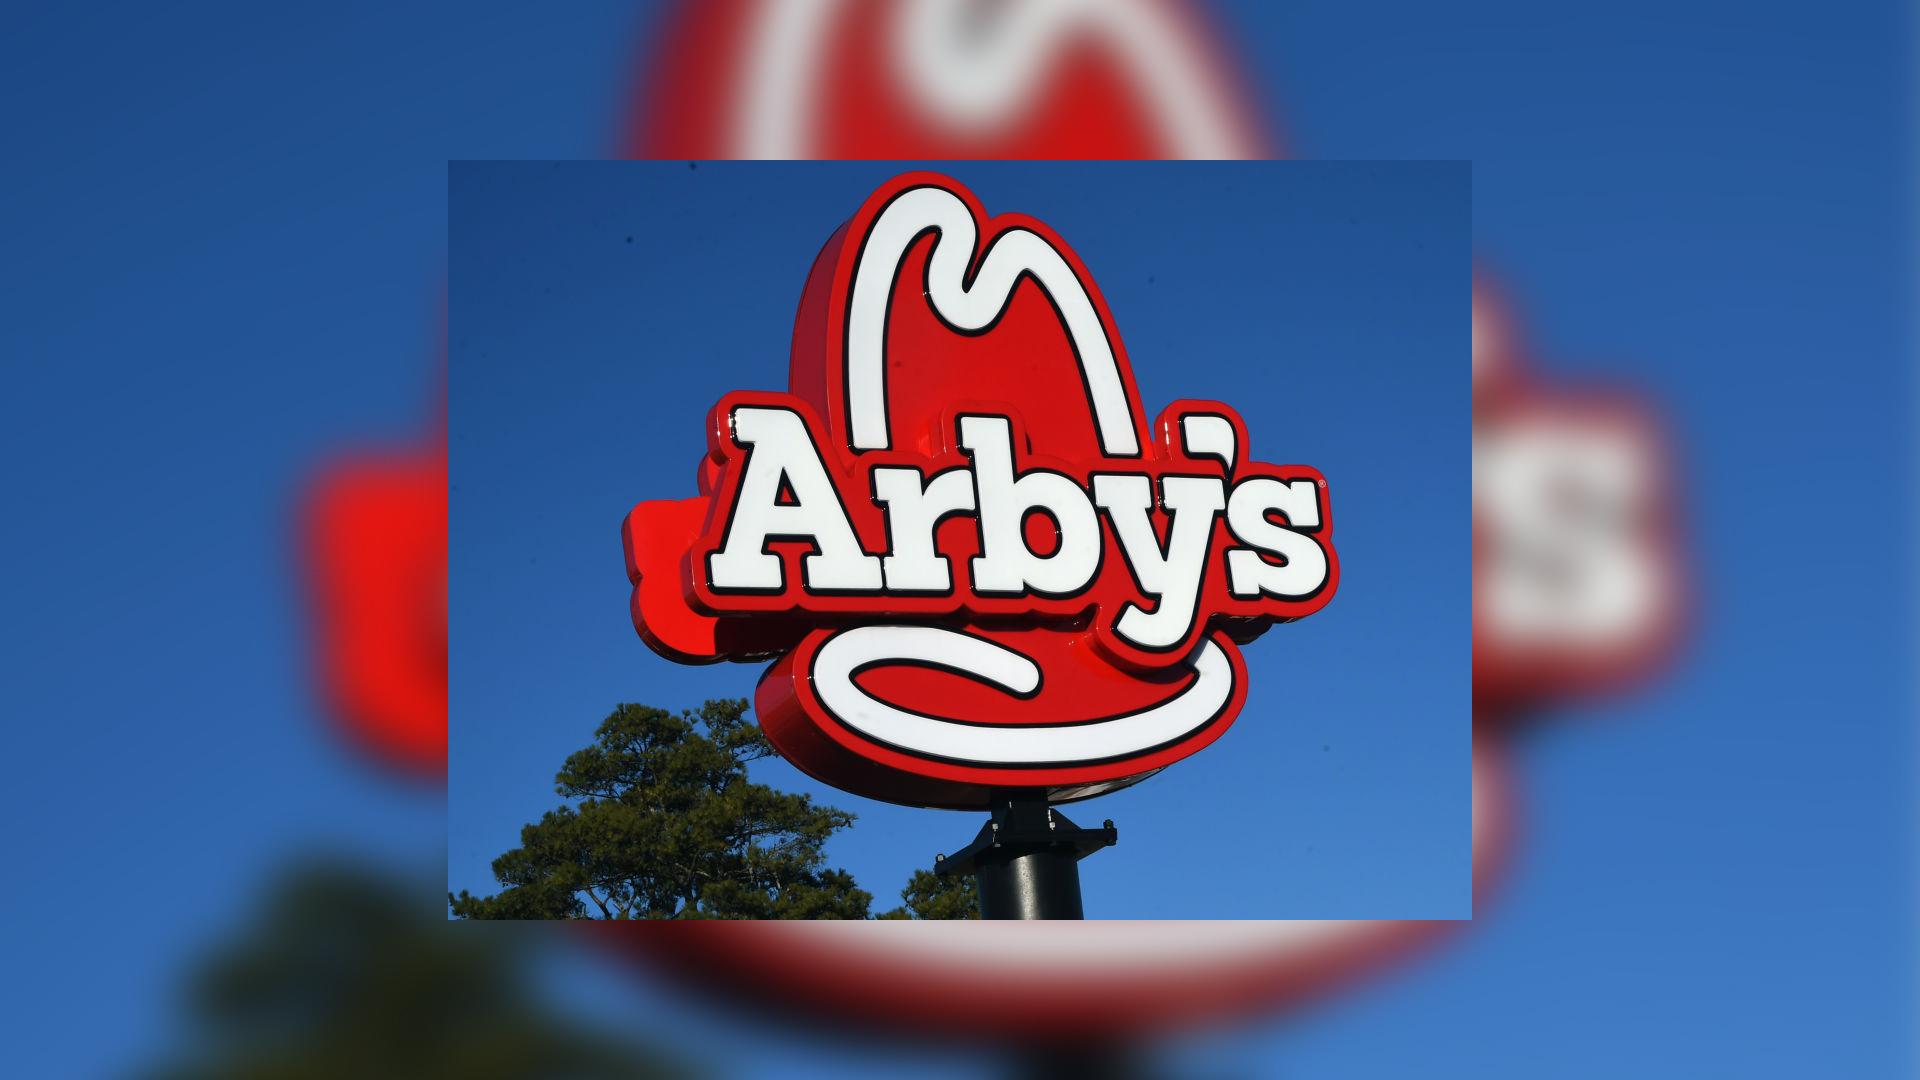 Arby's_1555331136043.jpg